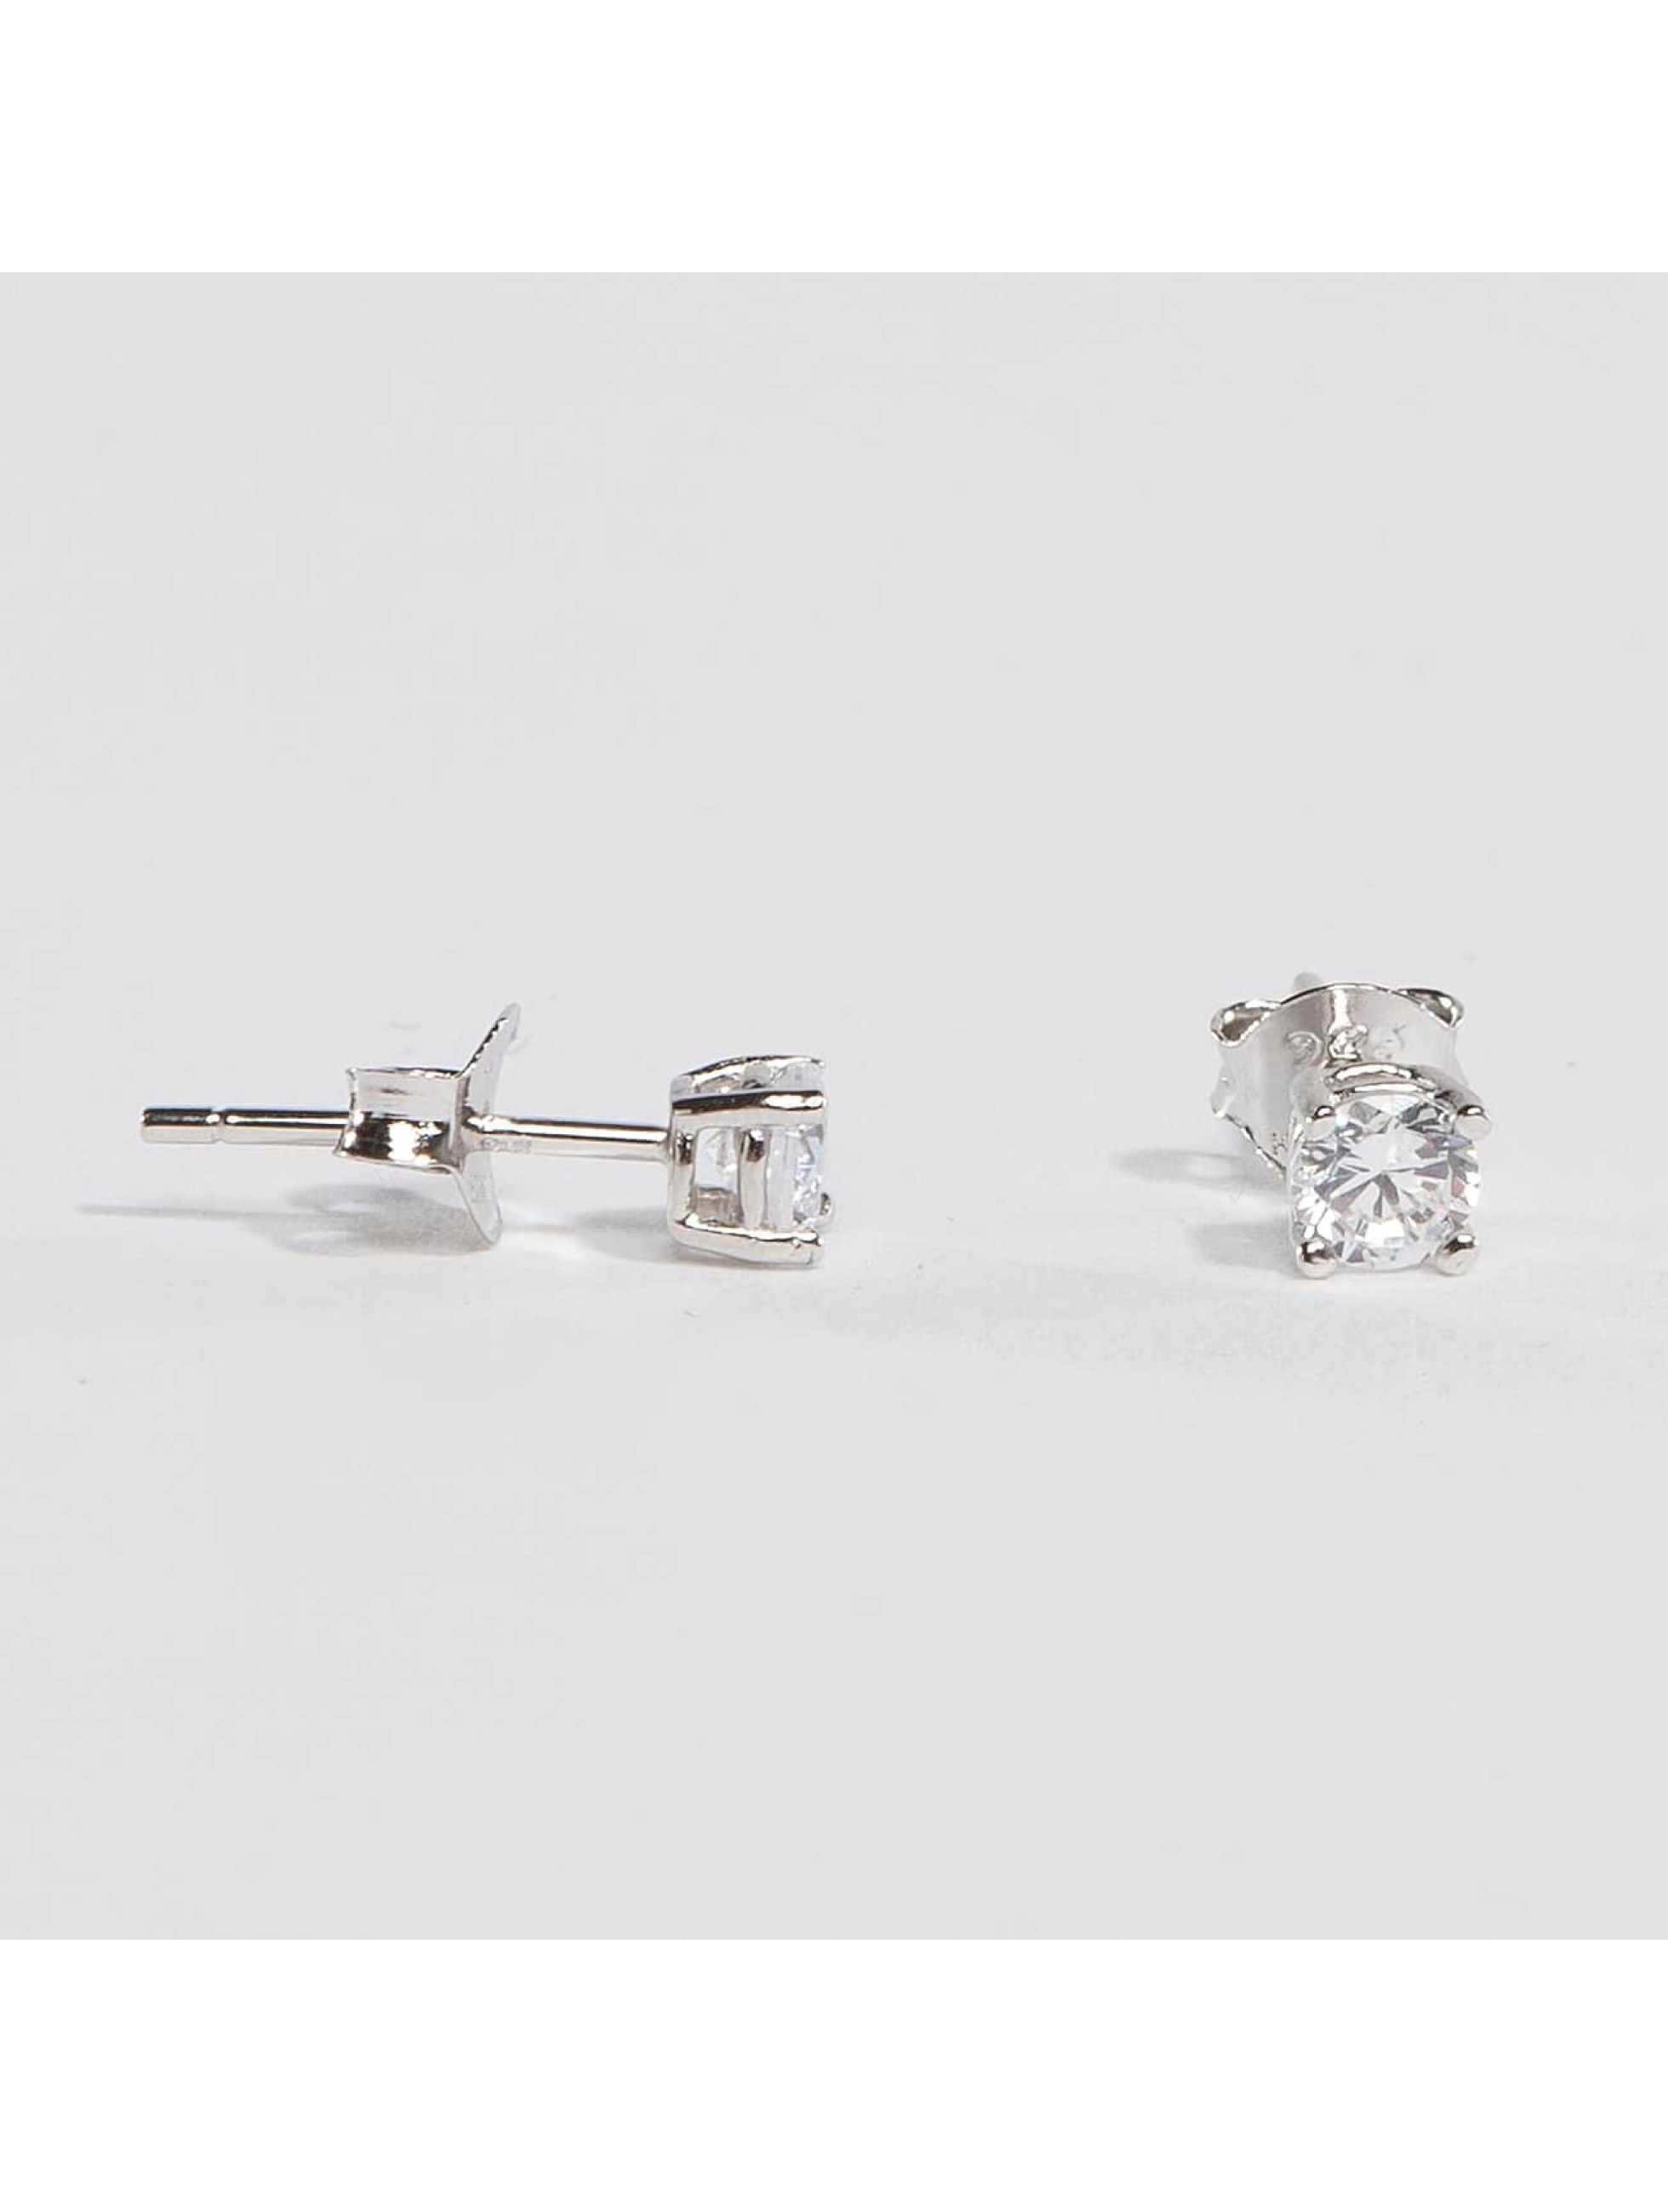 KING ICE Ohrringe Rhodium_Plated 4mm 925 Sterling_Silver CZ silberfarben